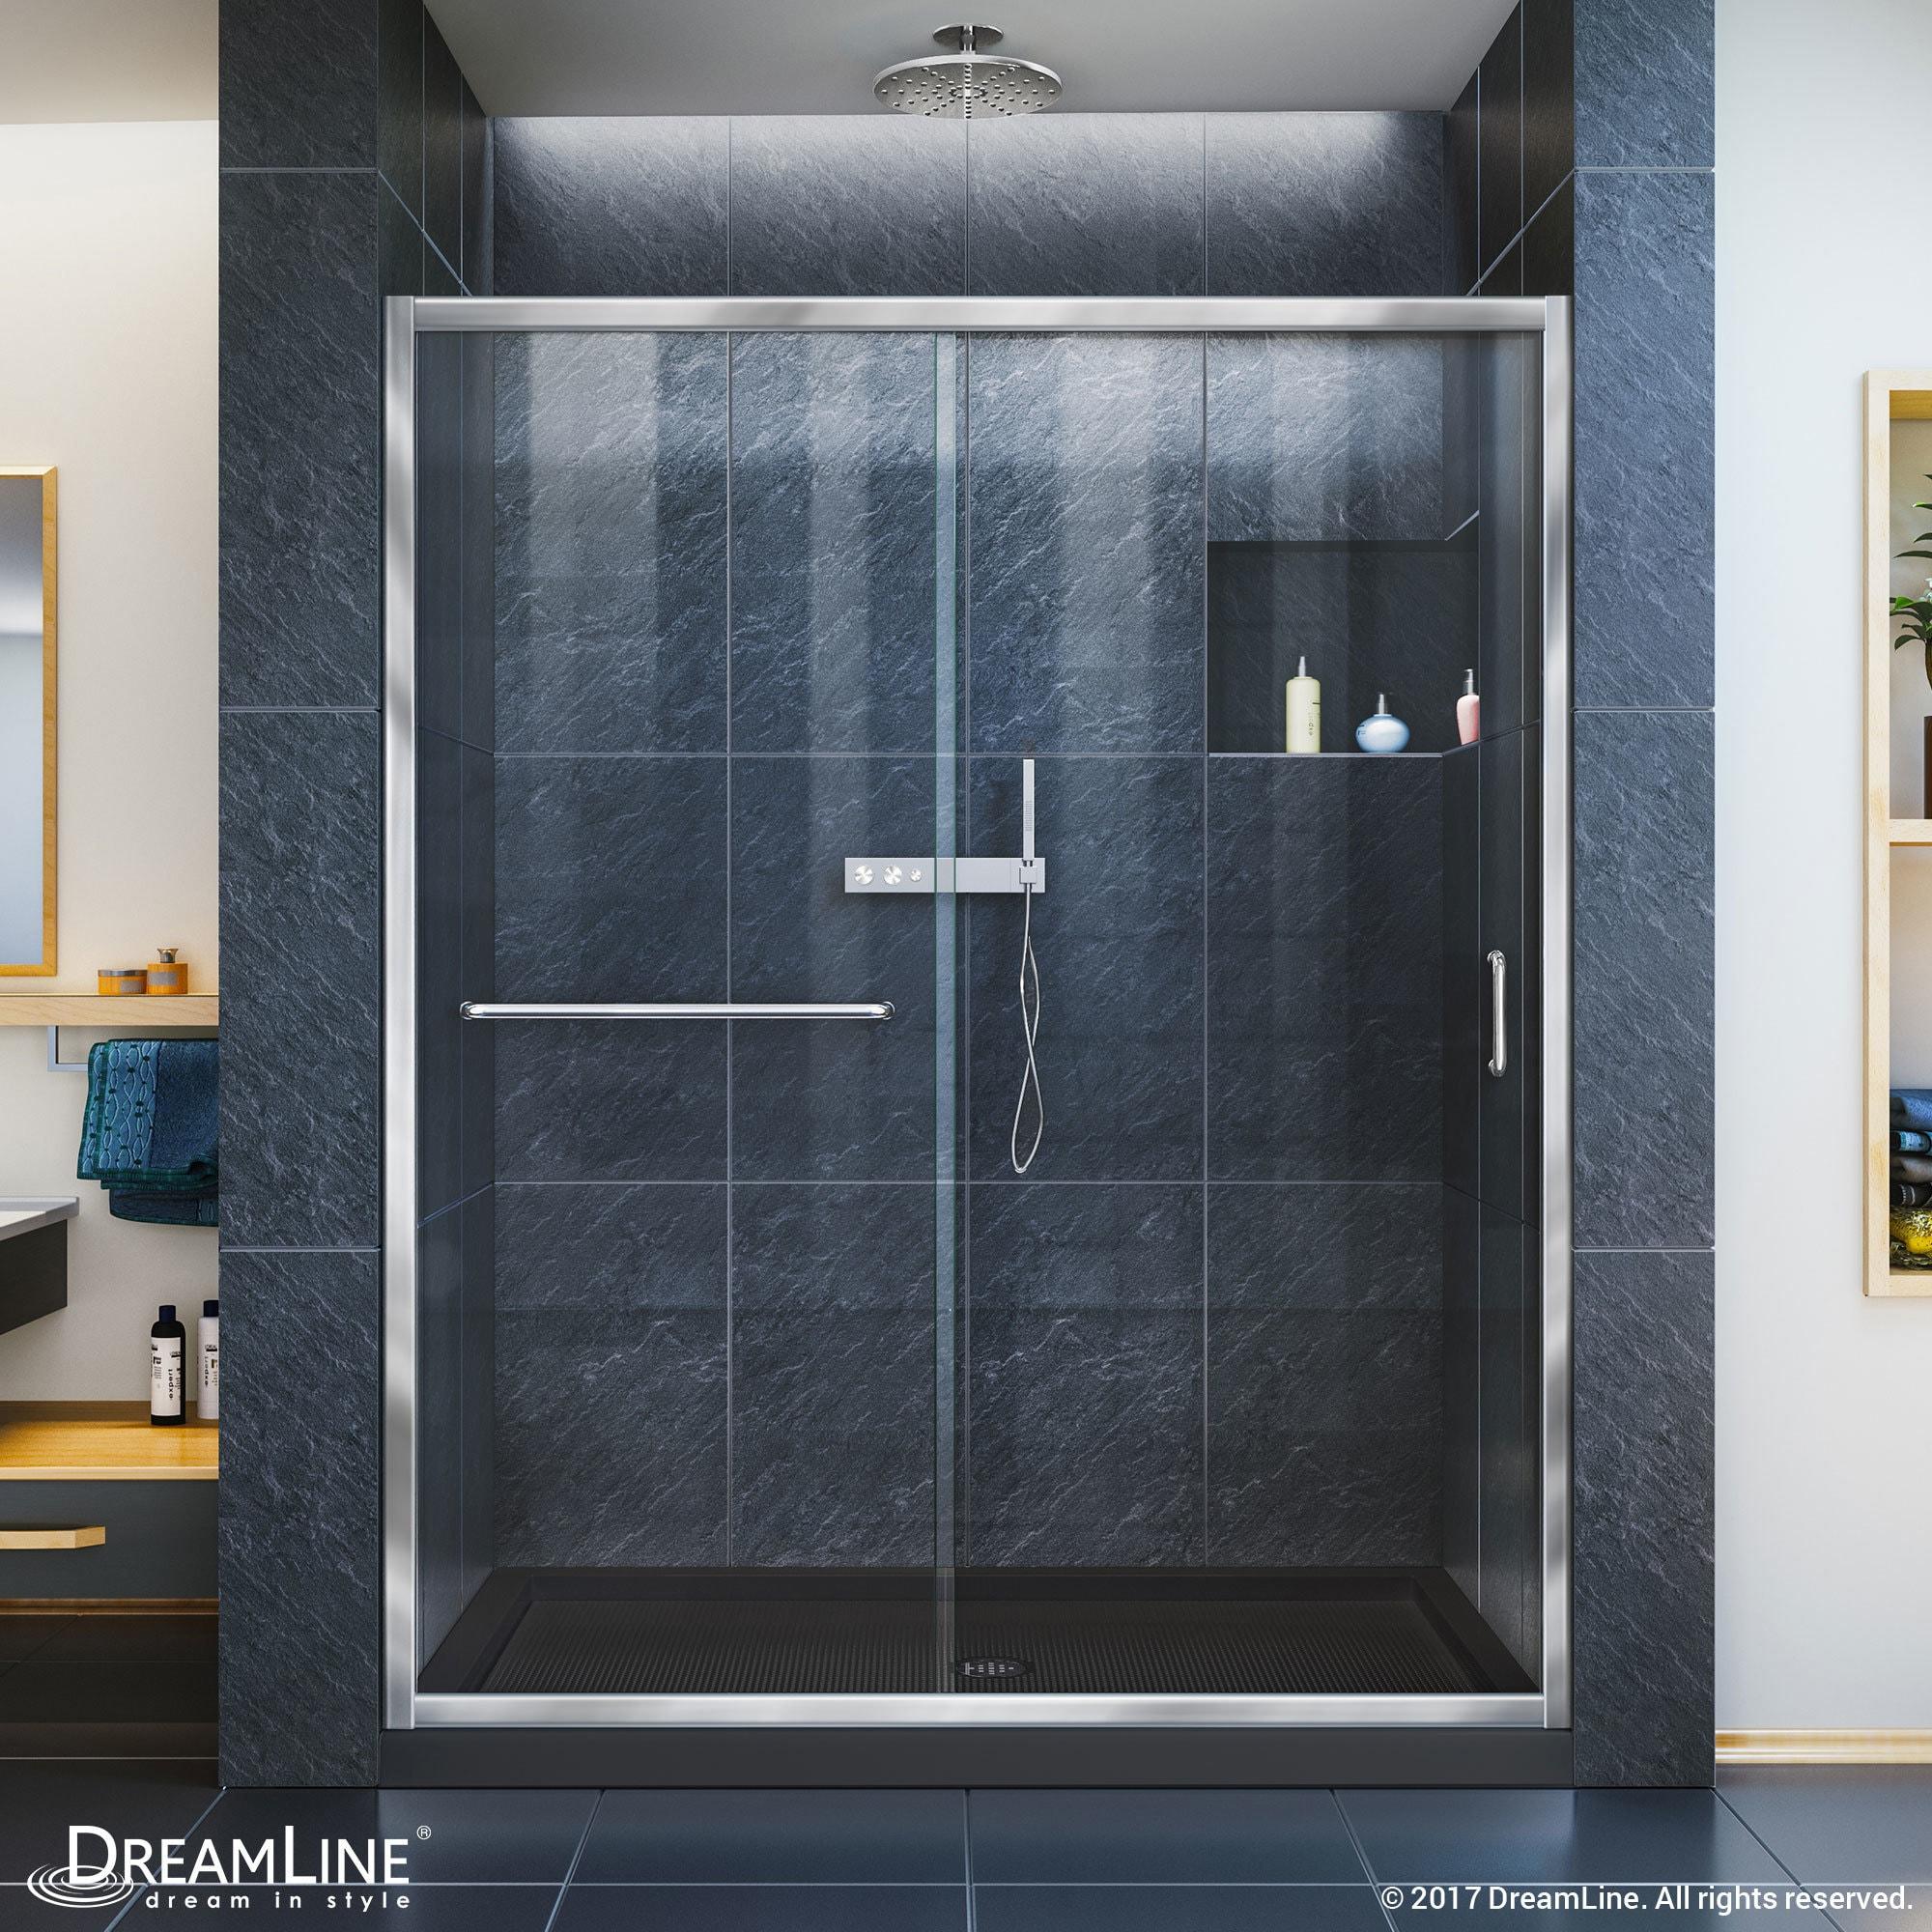 Dreamline Infinity Z 56 60 In W X 72 H Semi Frameless Sliding Shower Door Clear Gl Free Shipping Today 7990102